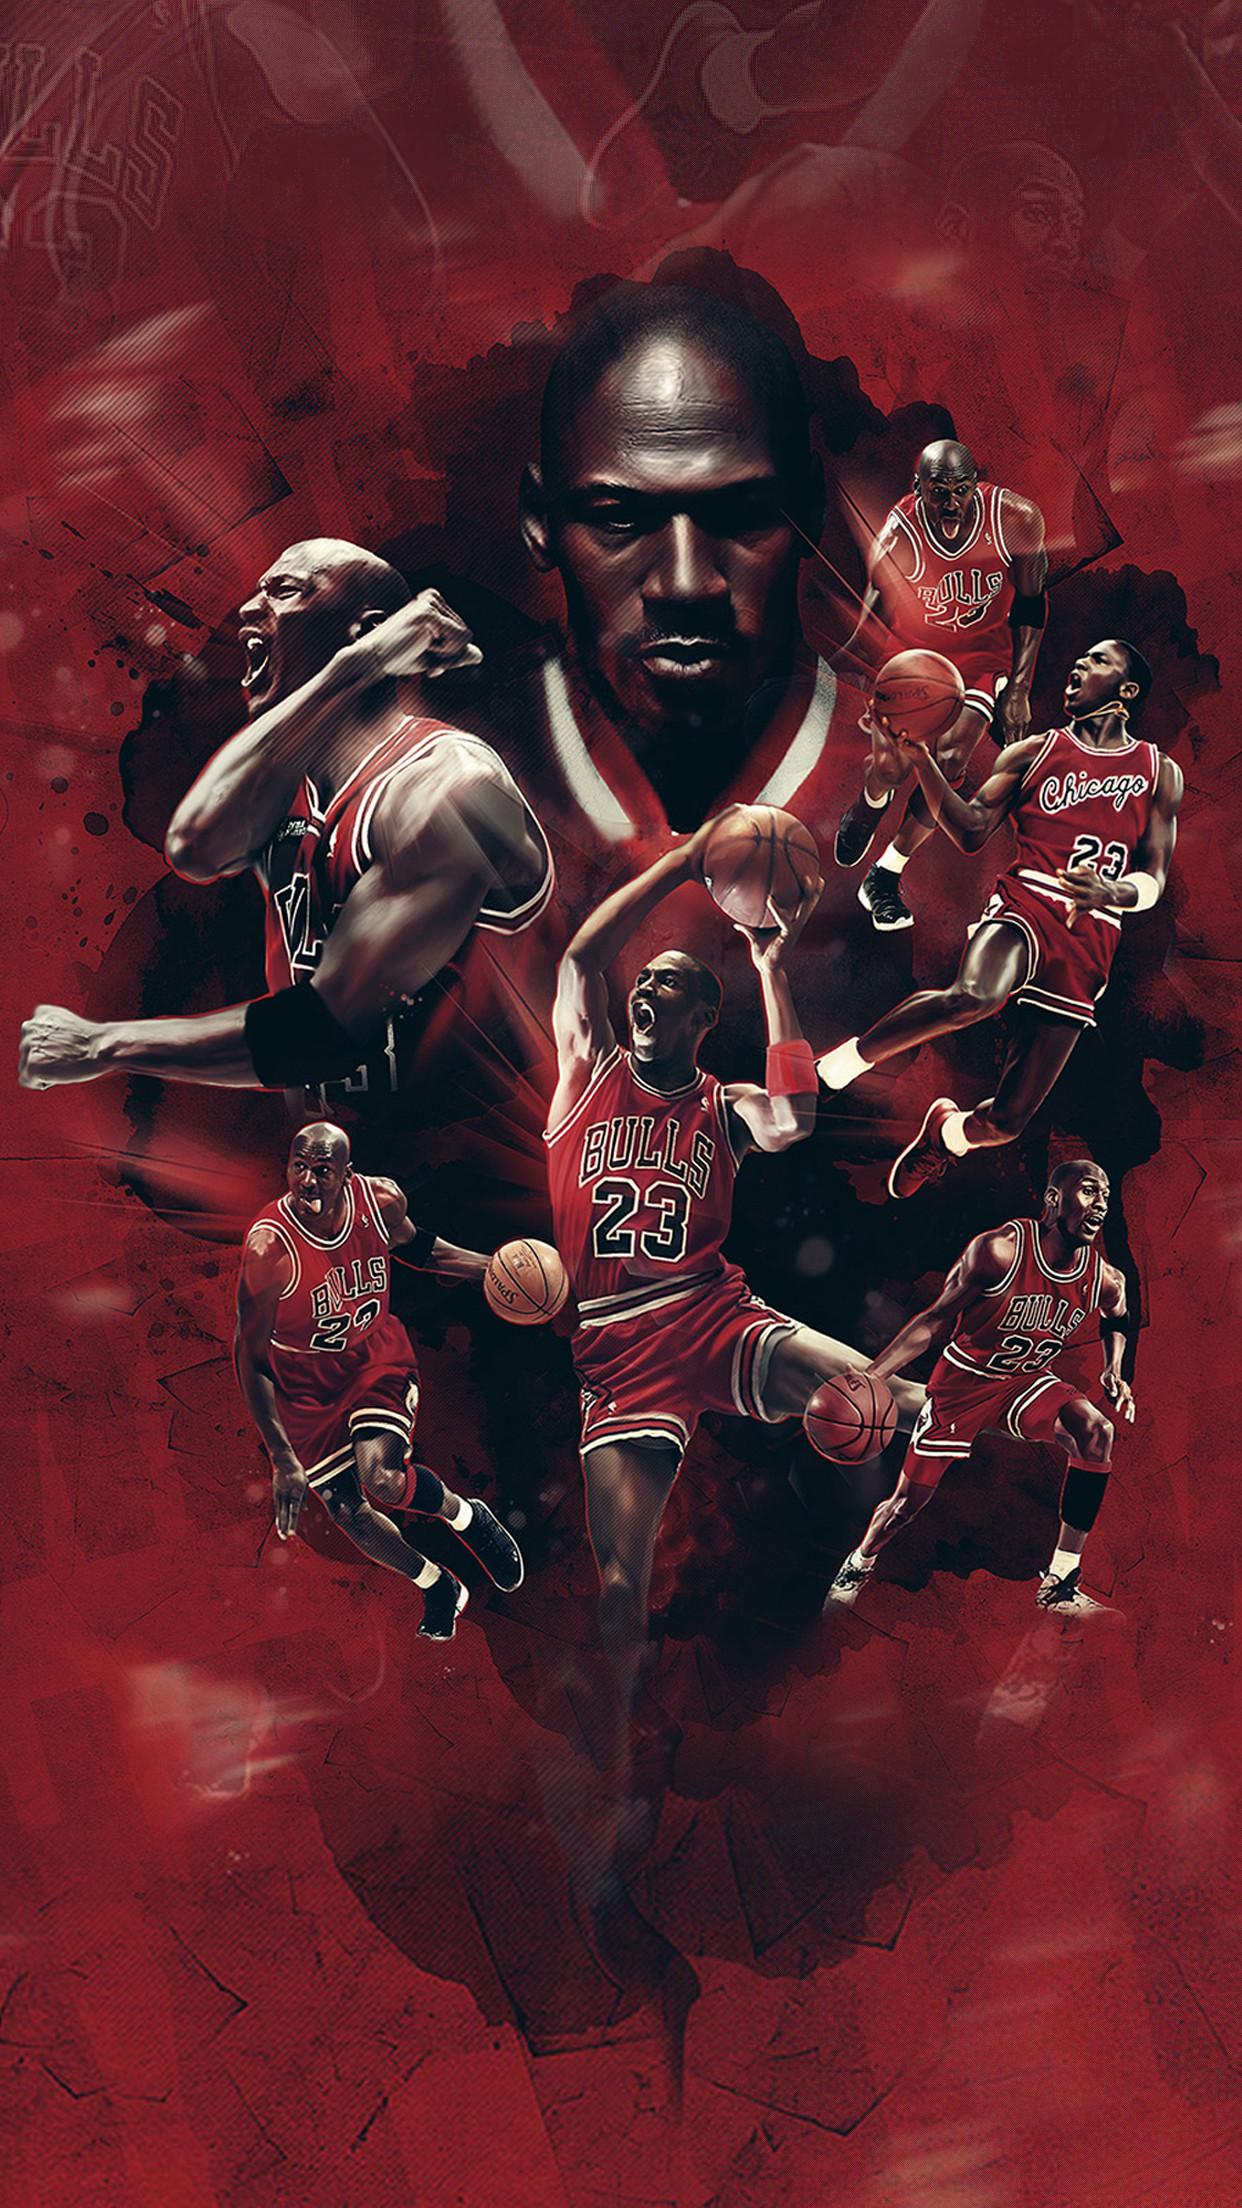 kupuj bestsellery Najnowsza autentyczna jakość Michael Jordan Wallpaper (76+ images)